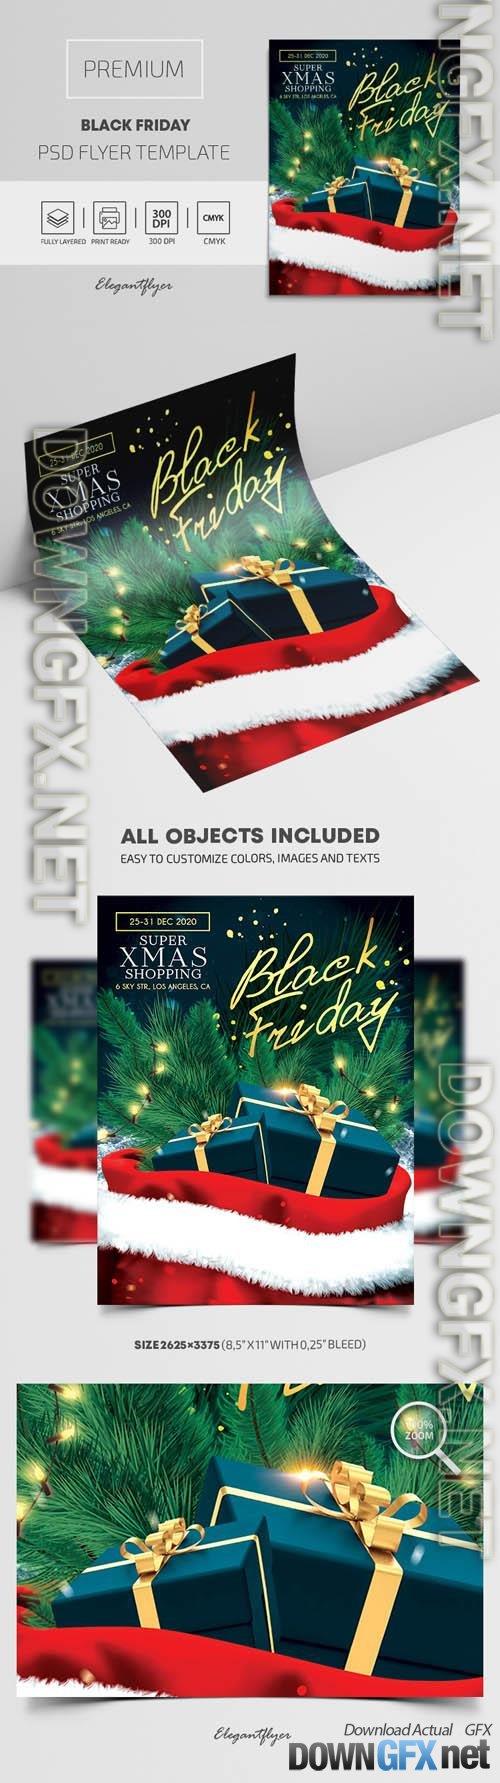 Black Friday Premium PSD Flyer Templatee